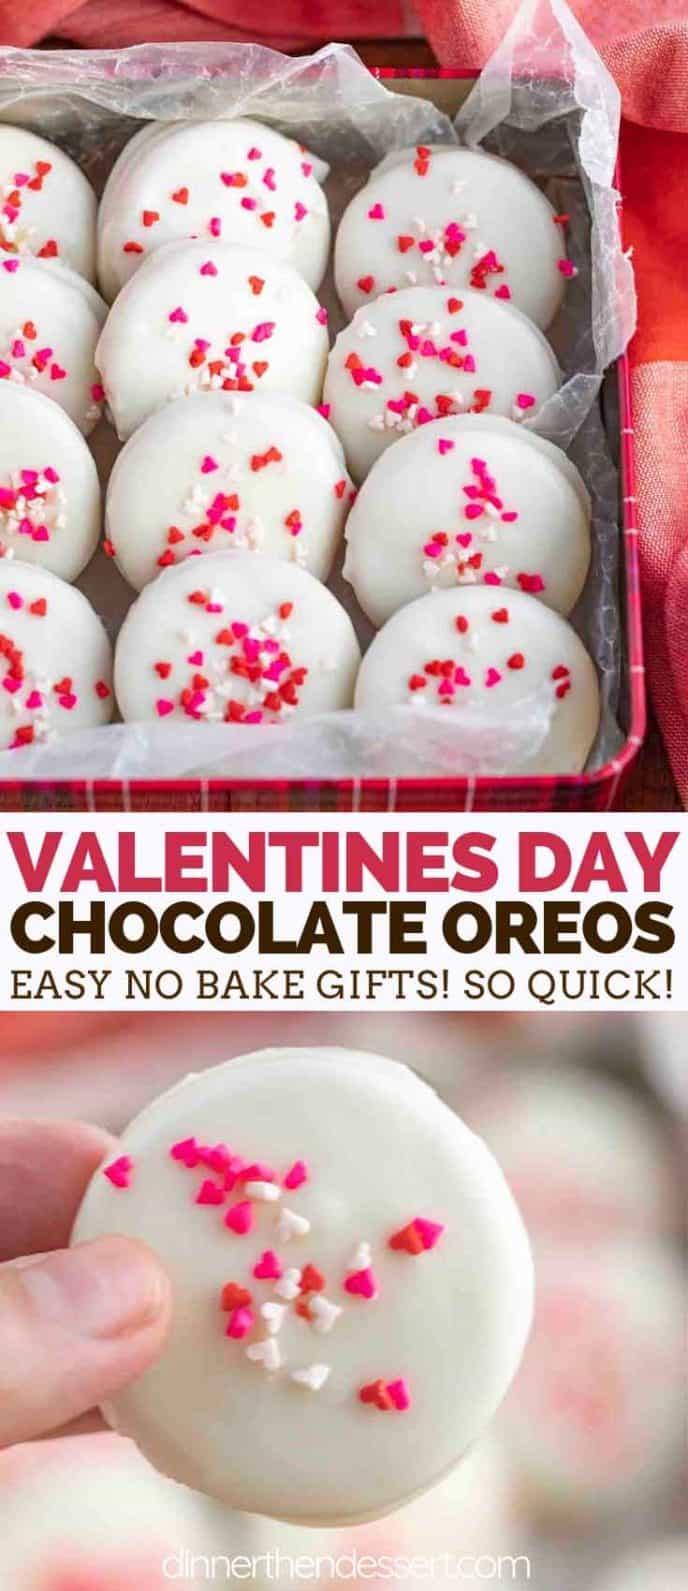 Valentines Day Chocolate Oreos